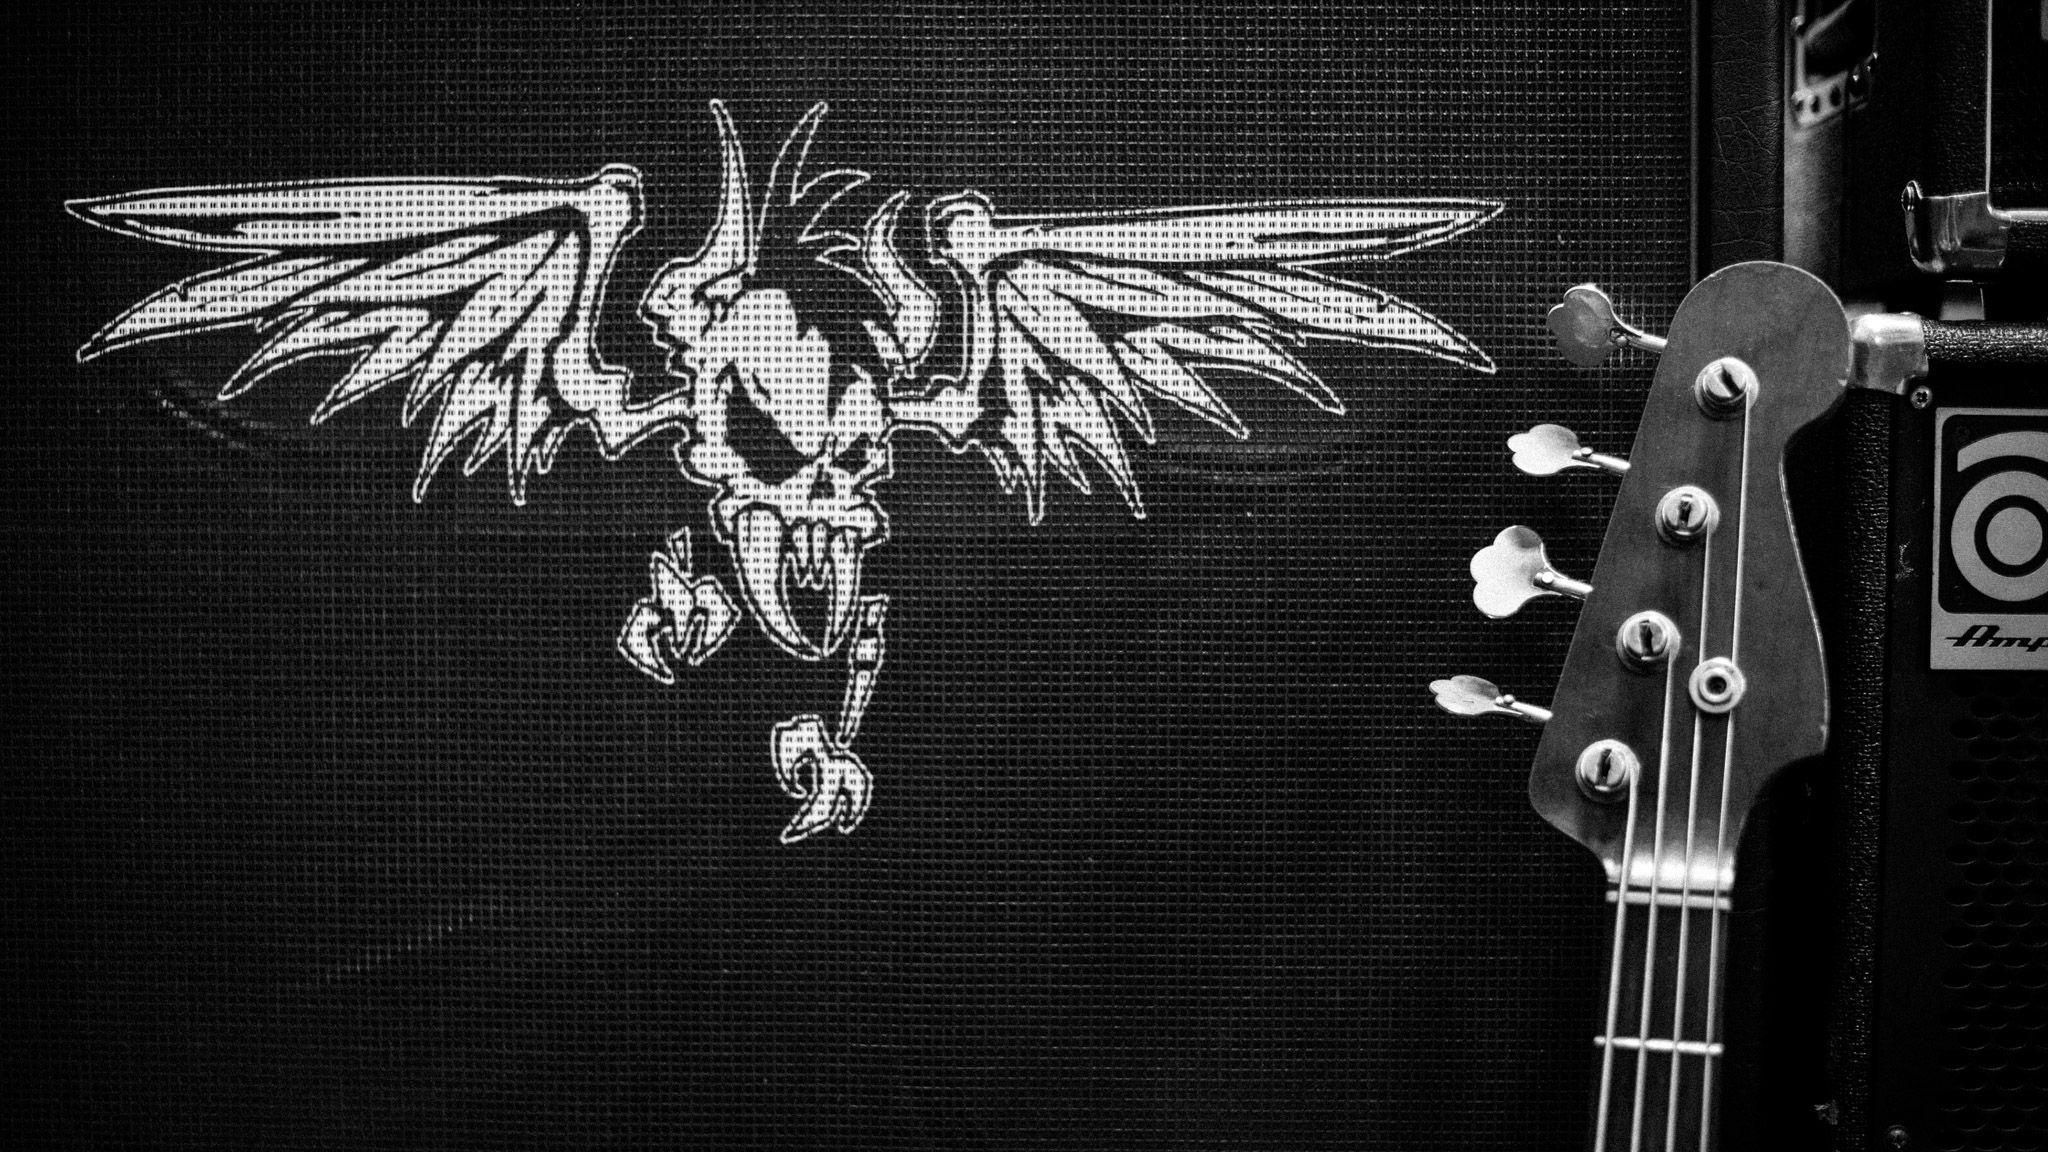 Metallica High Definition Wallpapers